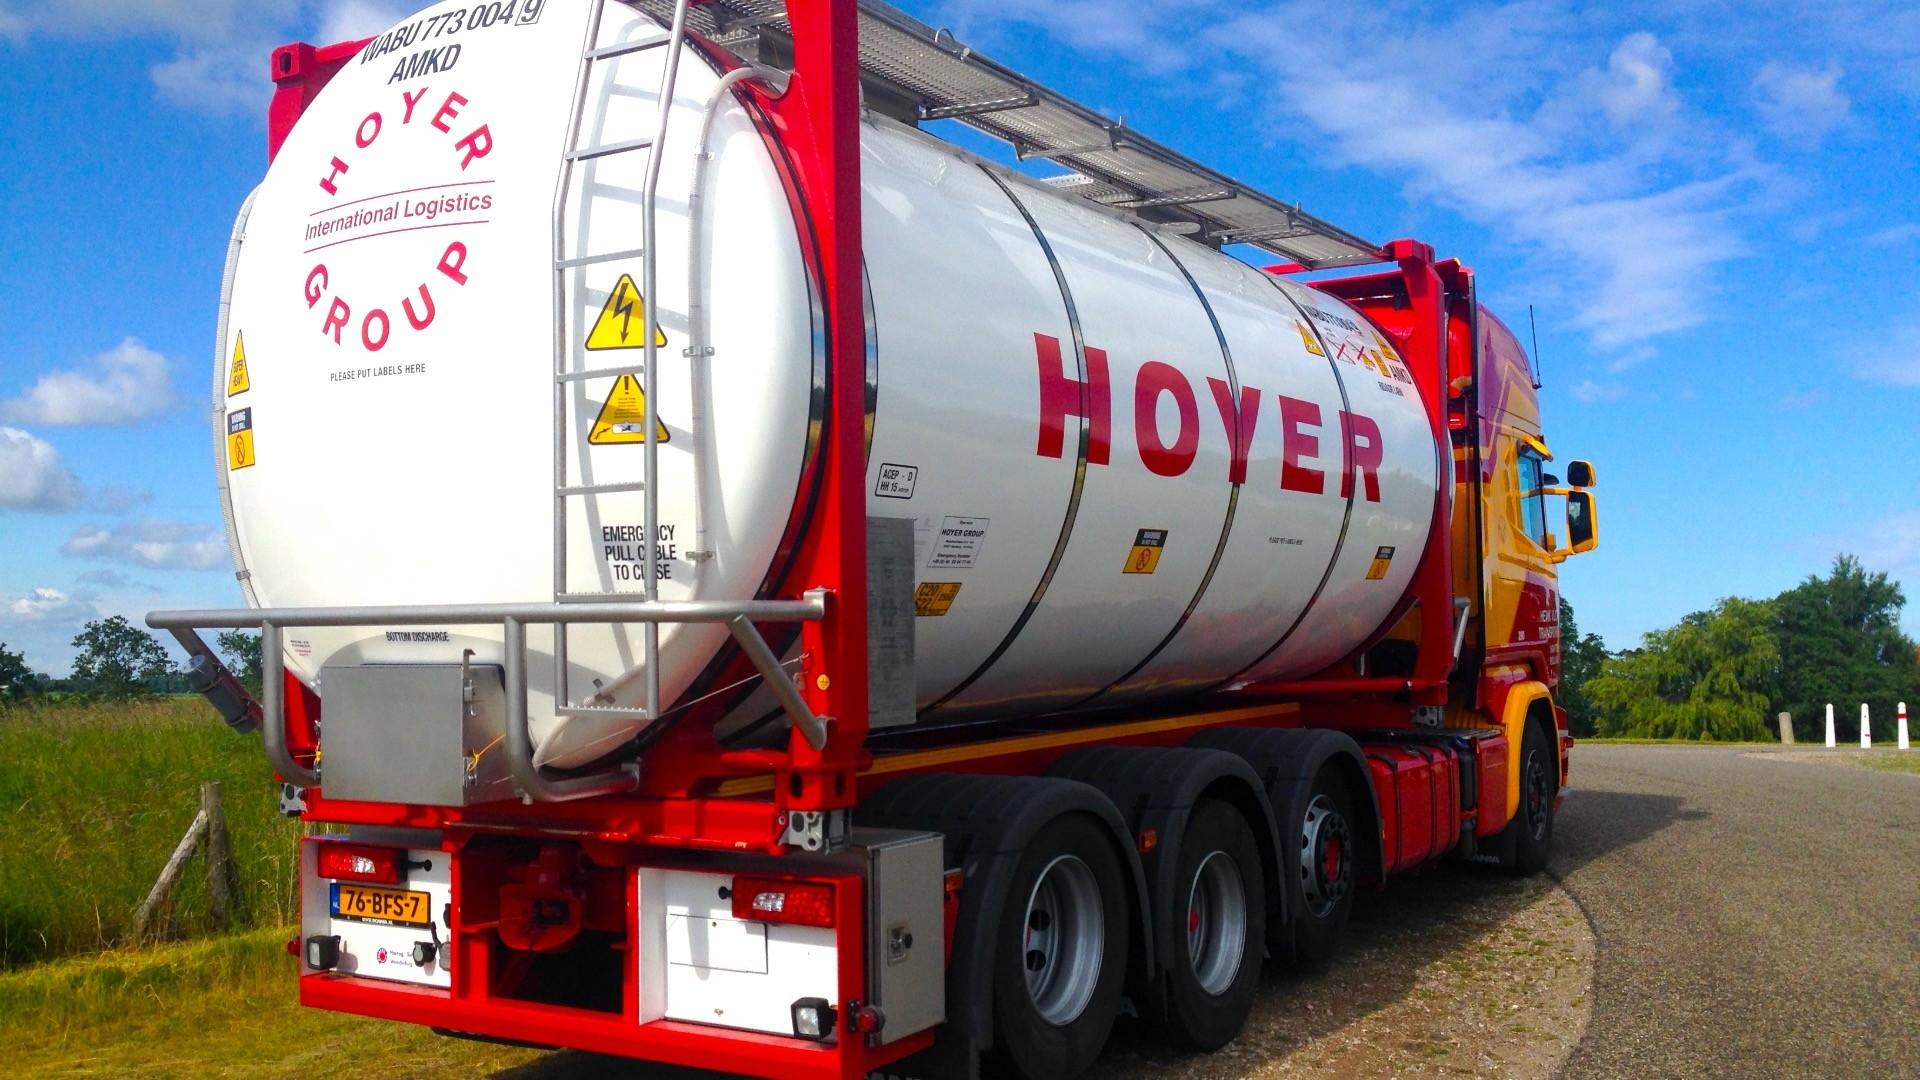 Hoyer wins BASF Supplier award 2015